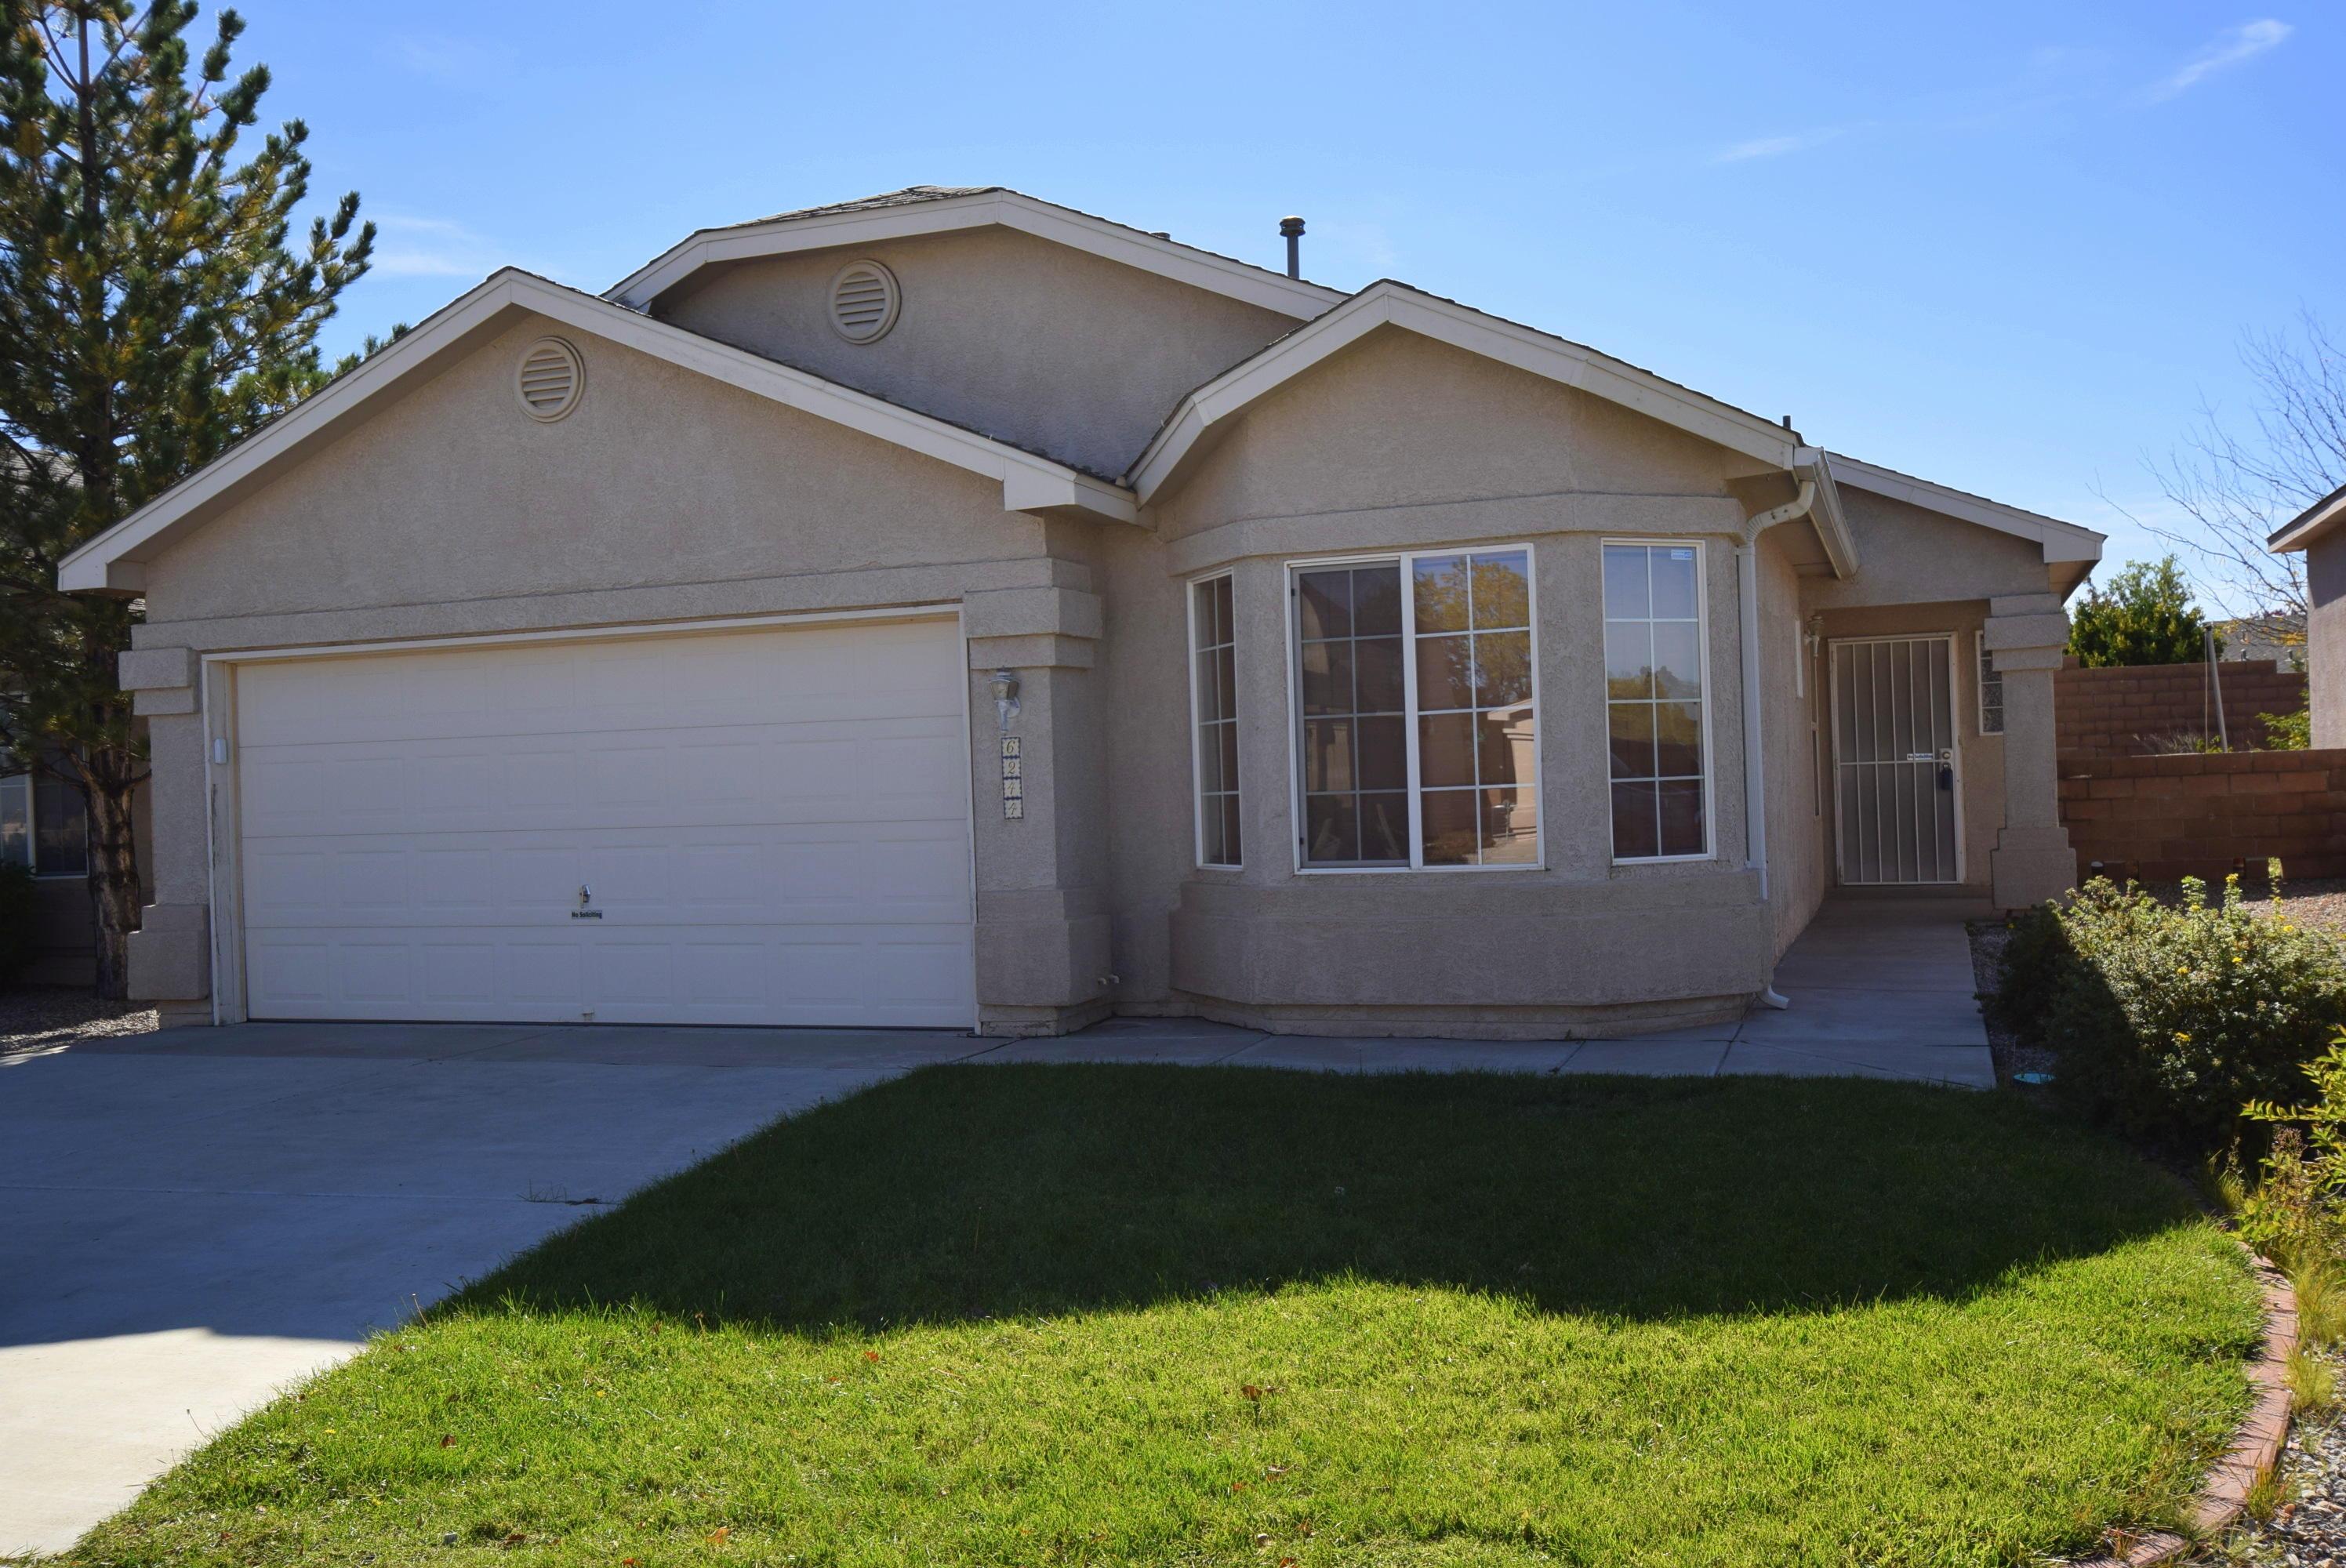 6244 NW Calle De Vida, Northwest Albuquerque and Northwest Heights, New Mexico